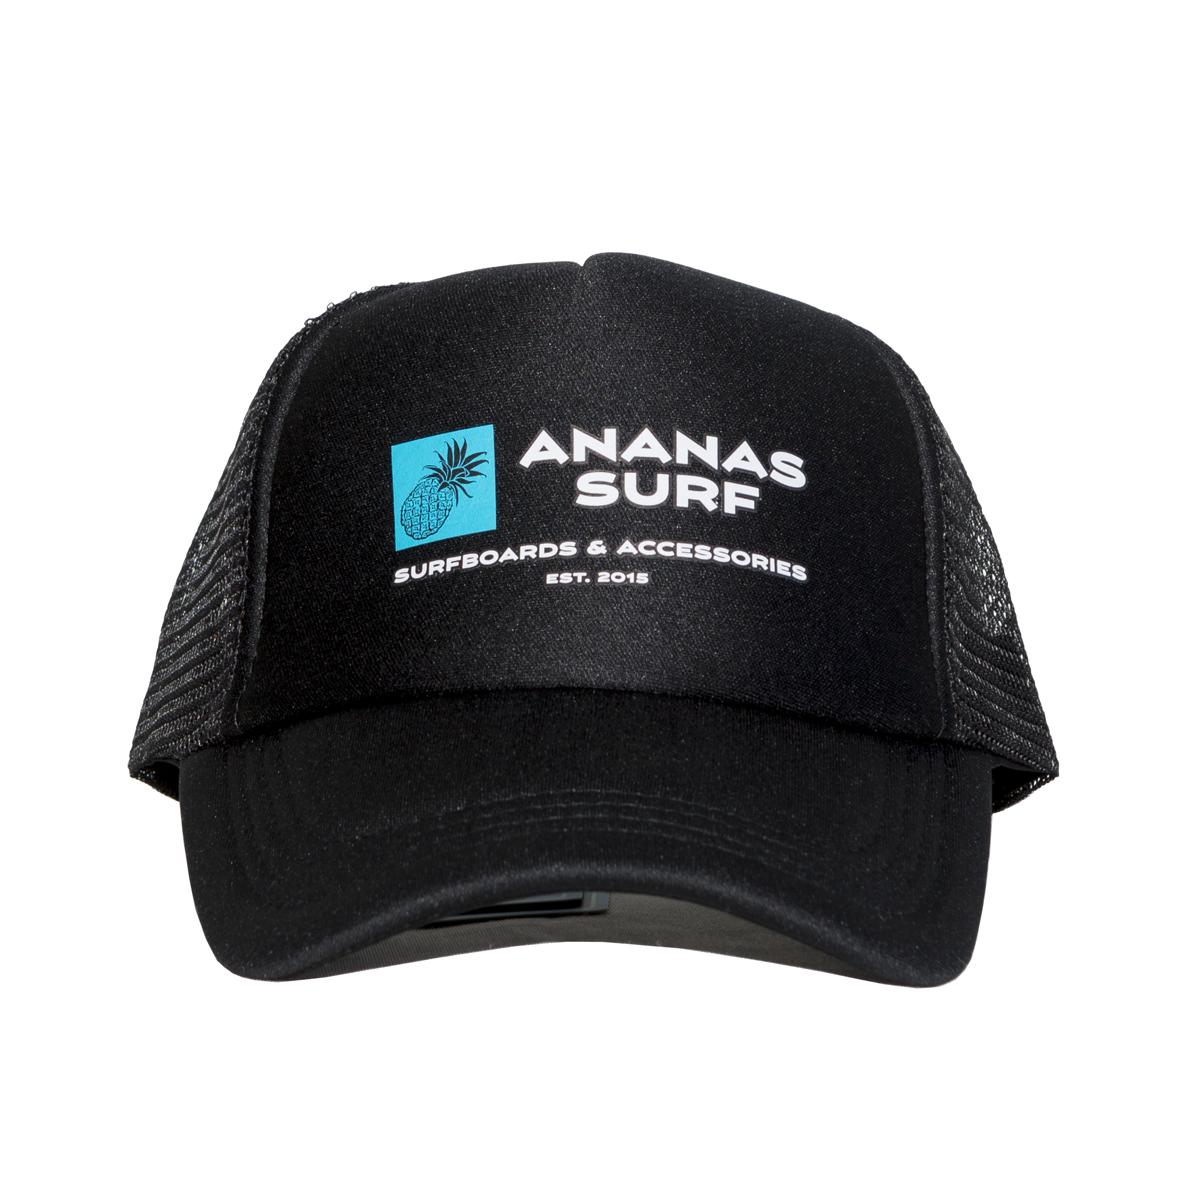 Ananas Surf The Logo beach mesh cap black